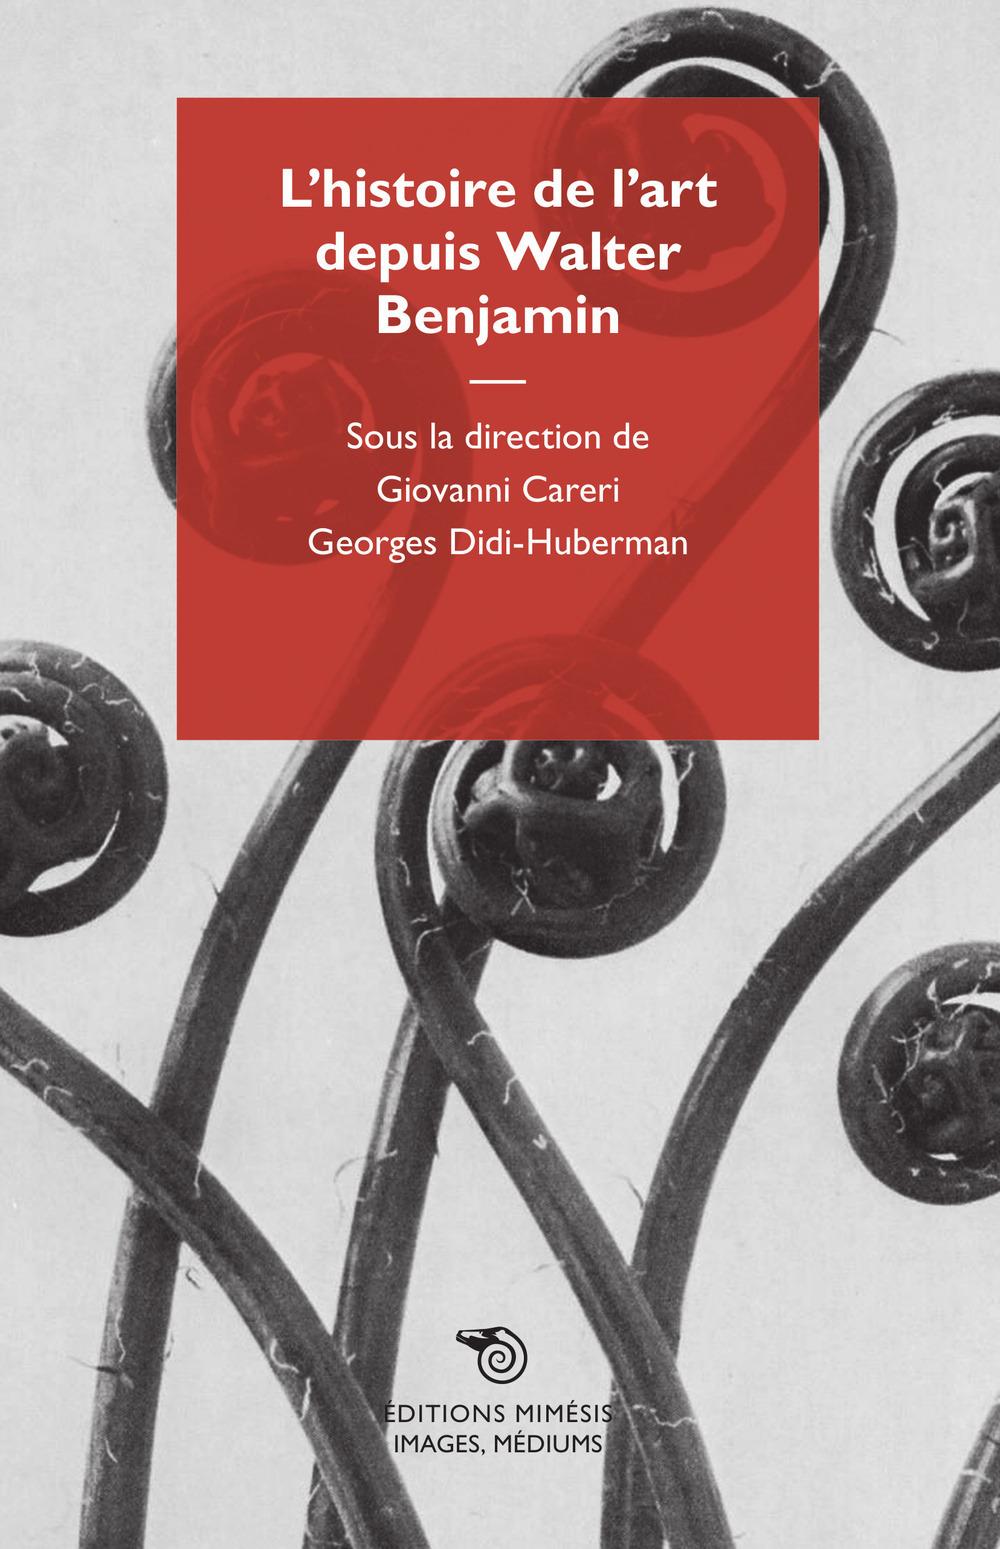 Image of L' histoire de l'art depuis Walter Benjamin